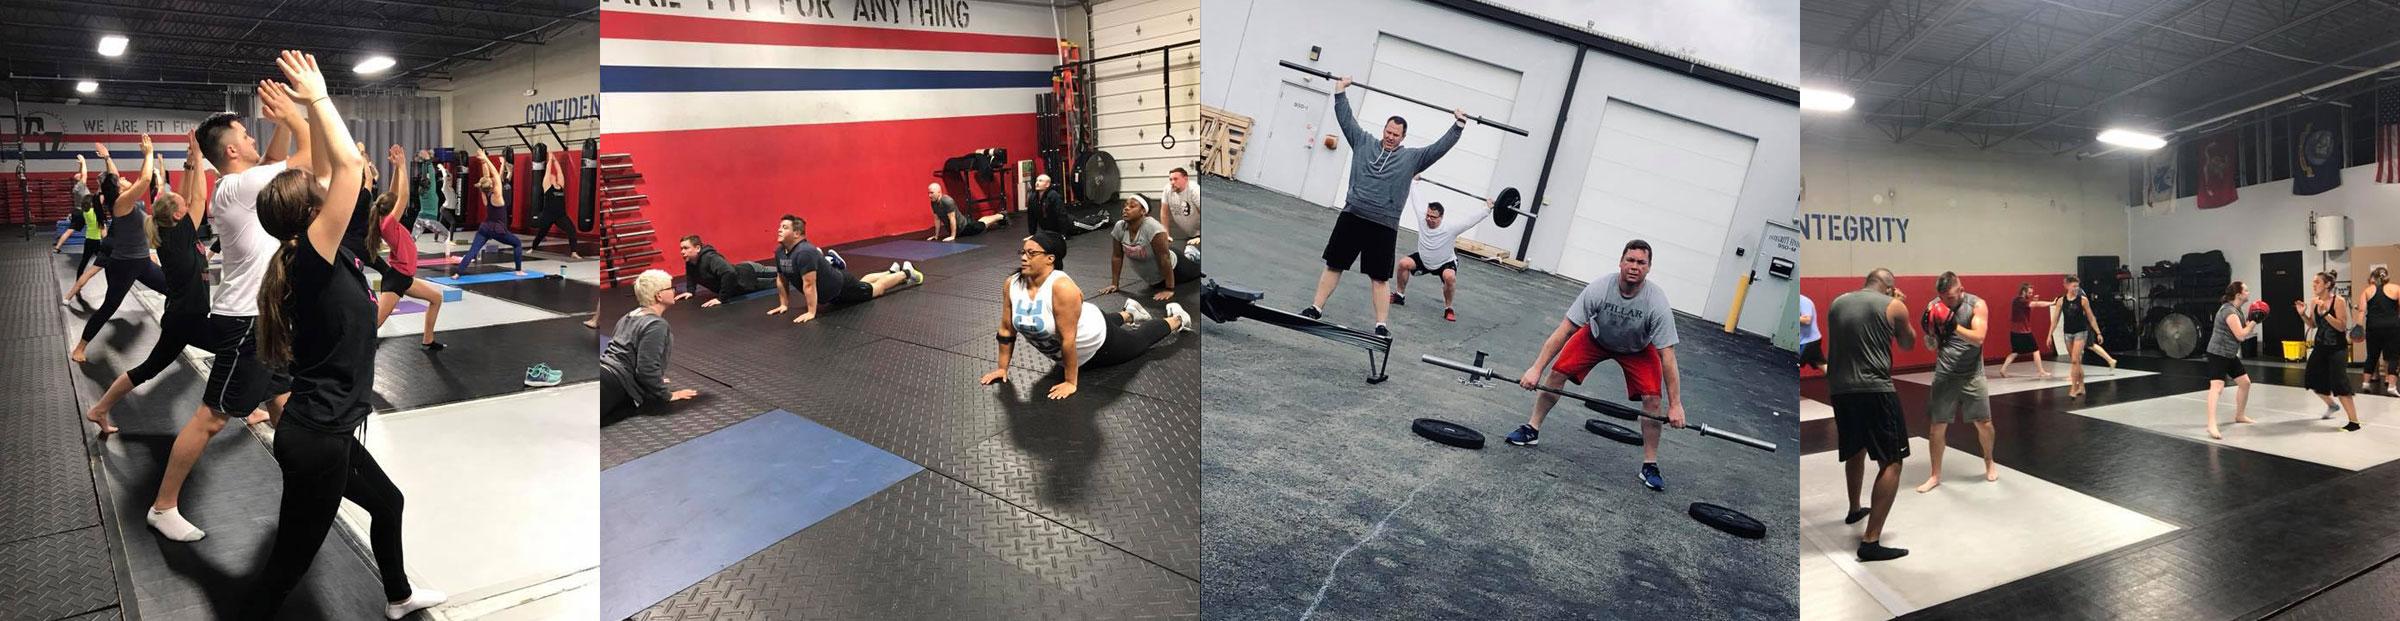 TEAM OKM   Krav Maga, Crossfit and Fitness Challenges